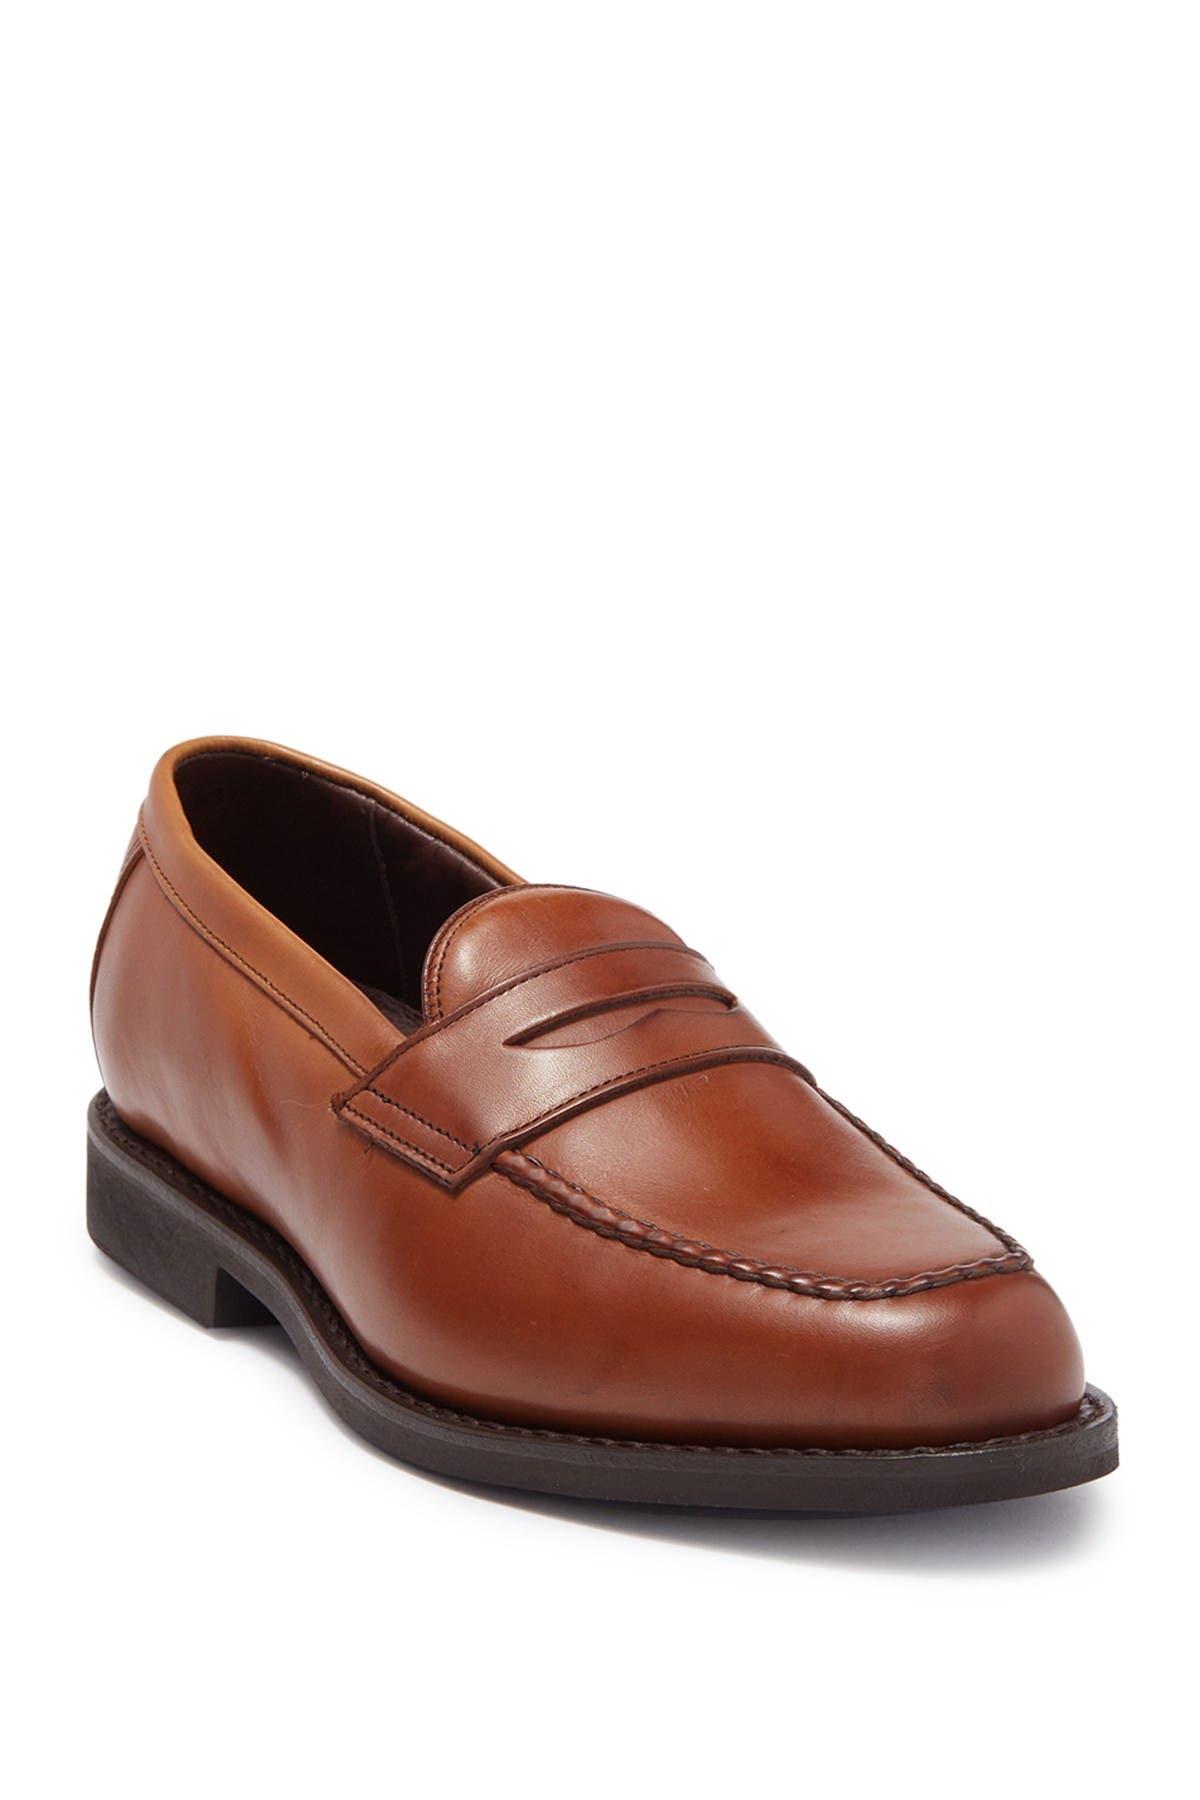 Image of Allen Edmonds Houston Leather Penny Loafer